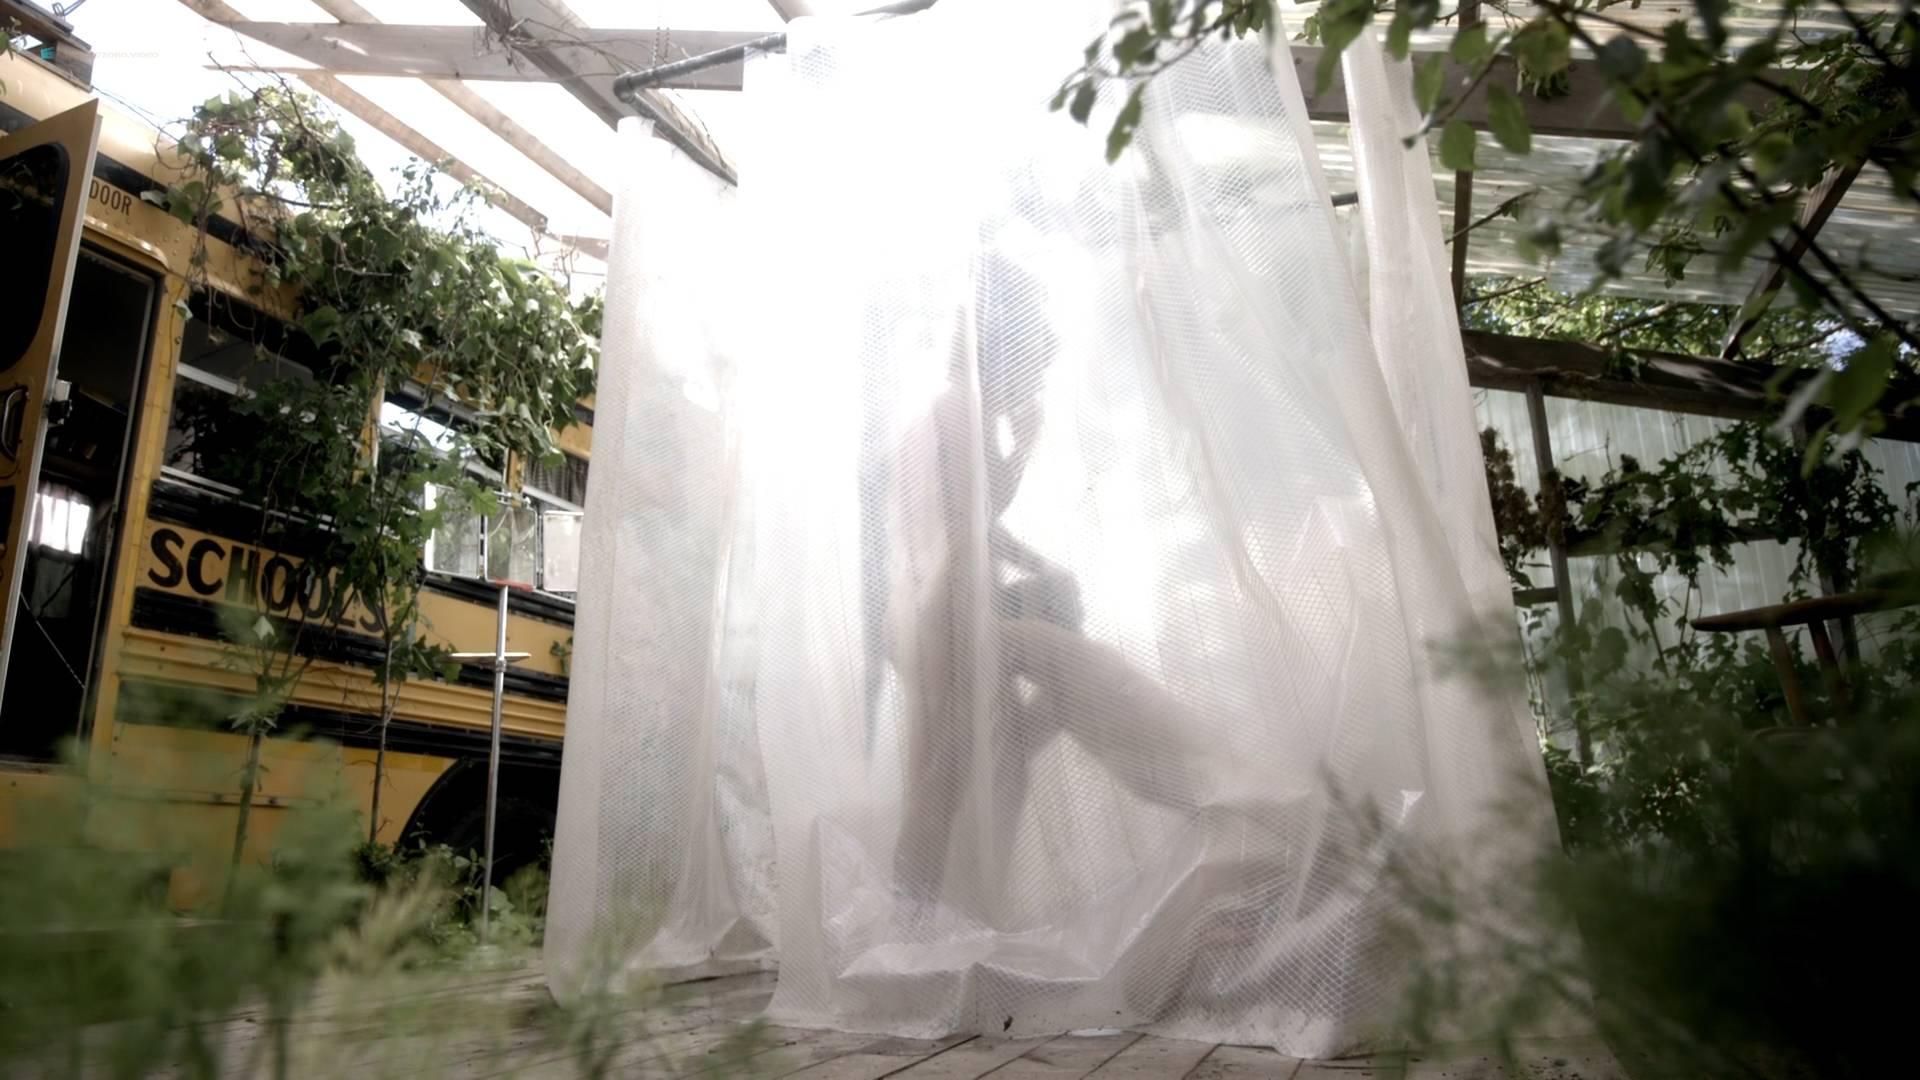 Essie-Davis-topless-Anna-Paquin-Rachelle-Lefevre-Juno-Temple-hot-and-sexy-P.K.D-Electric-Dreams-2017-s1e5-6-8-HD-1080p-013.jpg